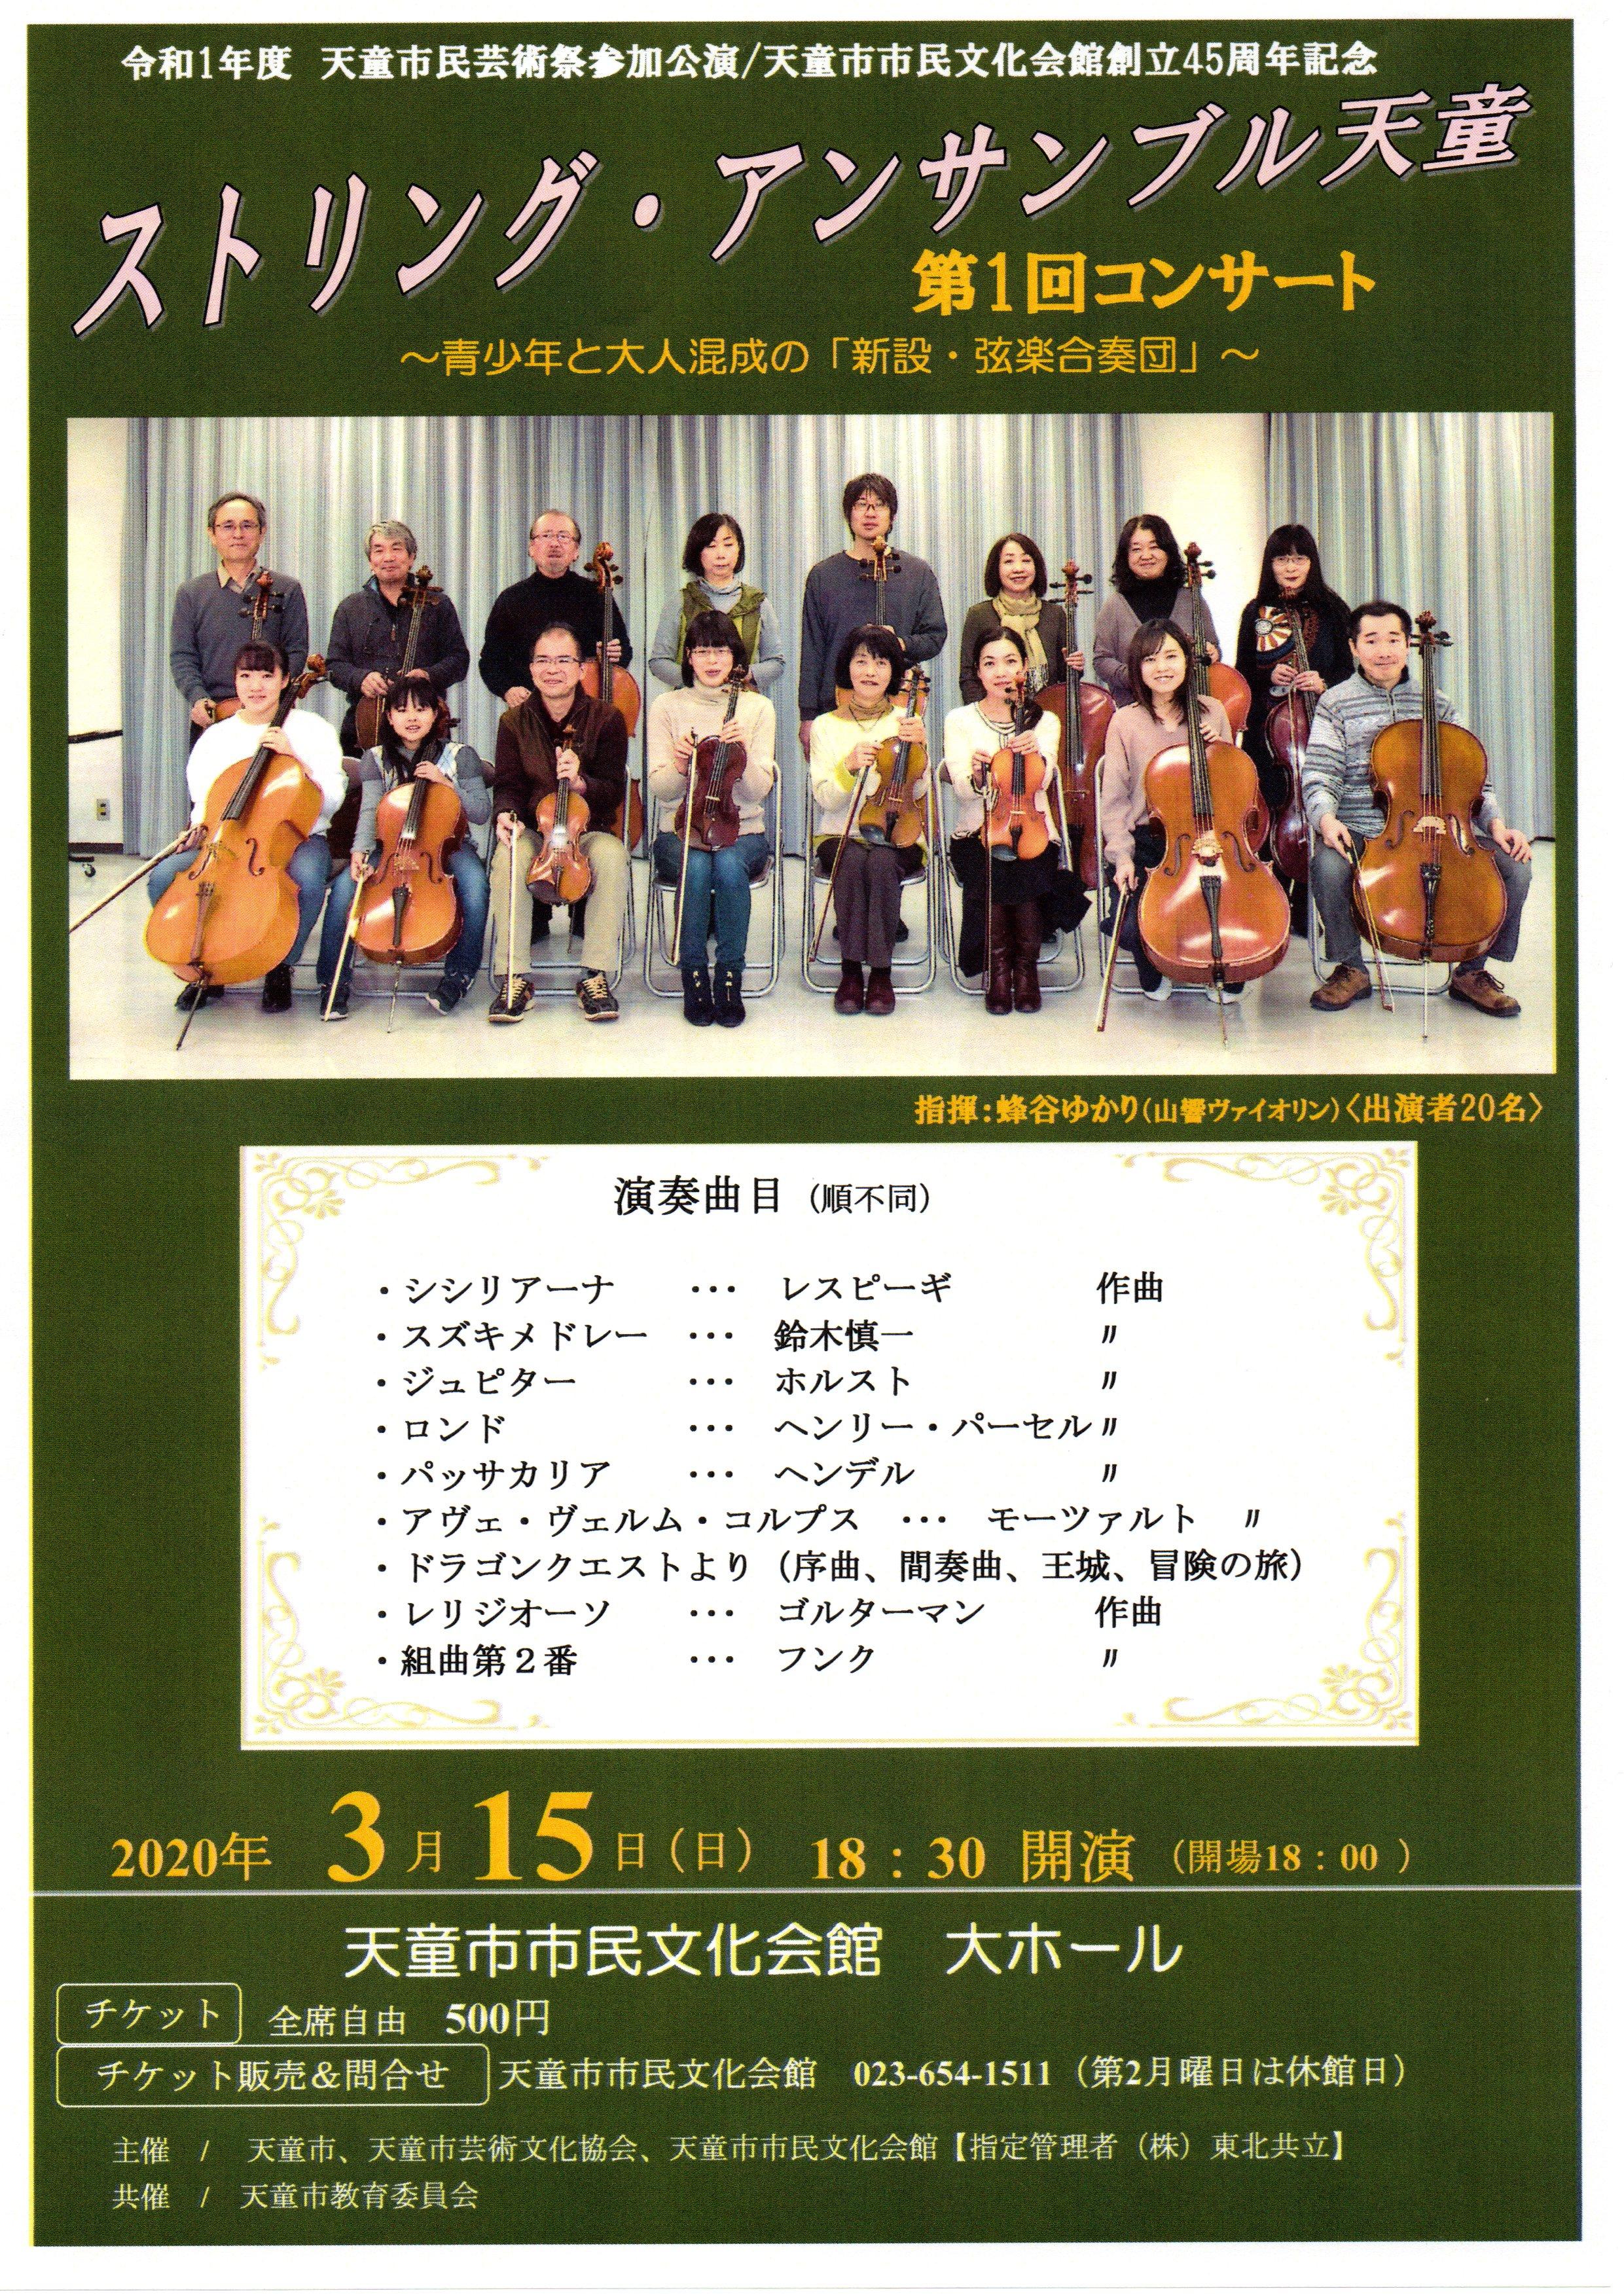 Love Music YAMAGATA│山形の音楽情報ポータルサイト